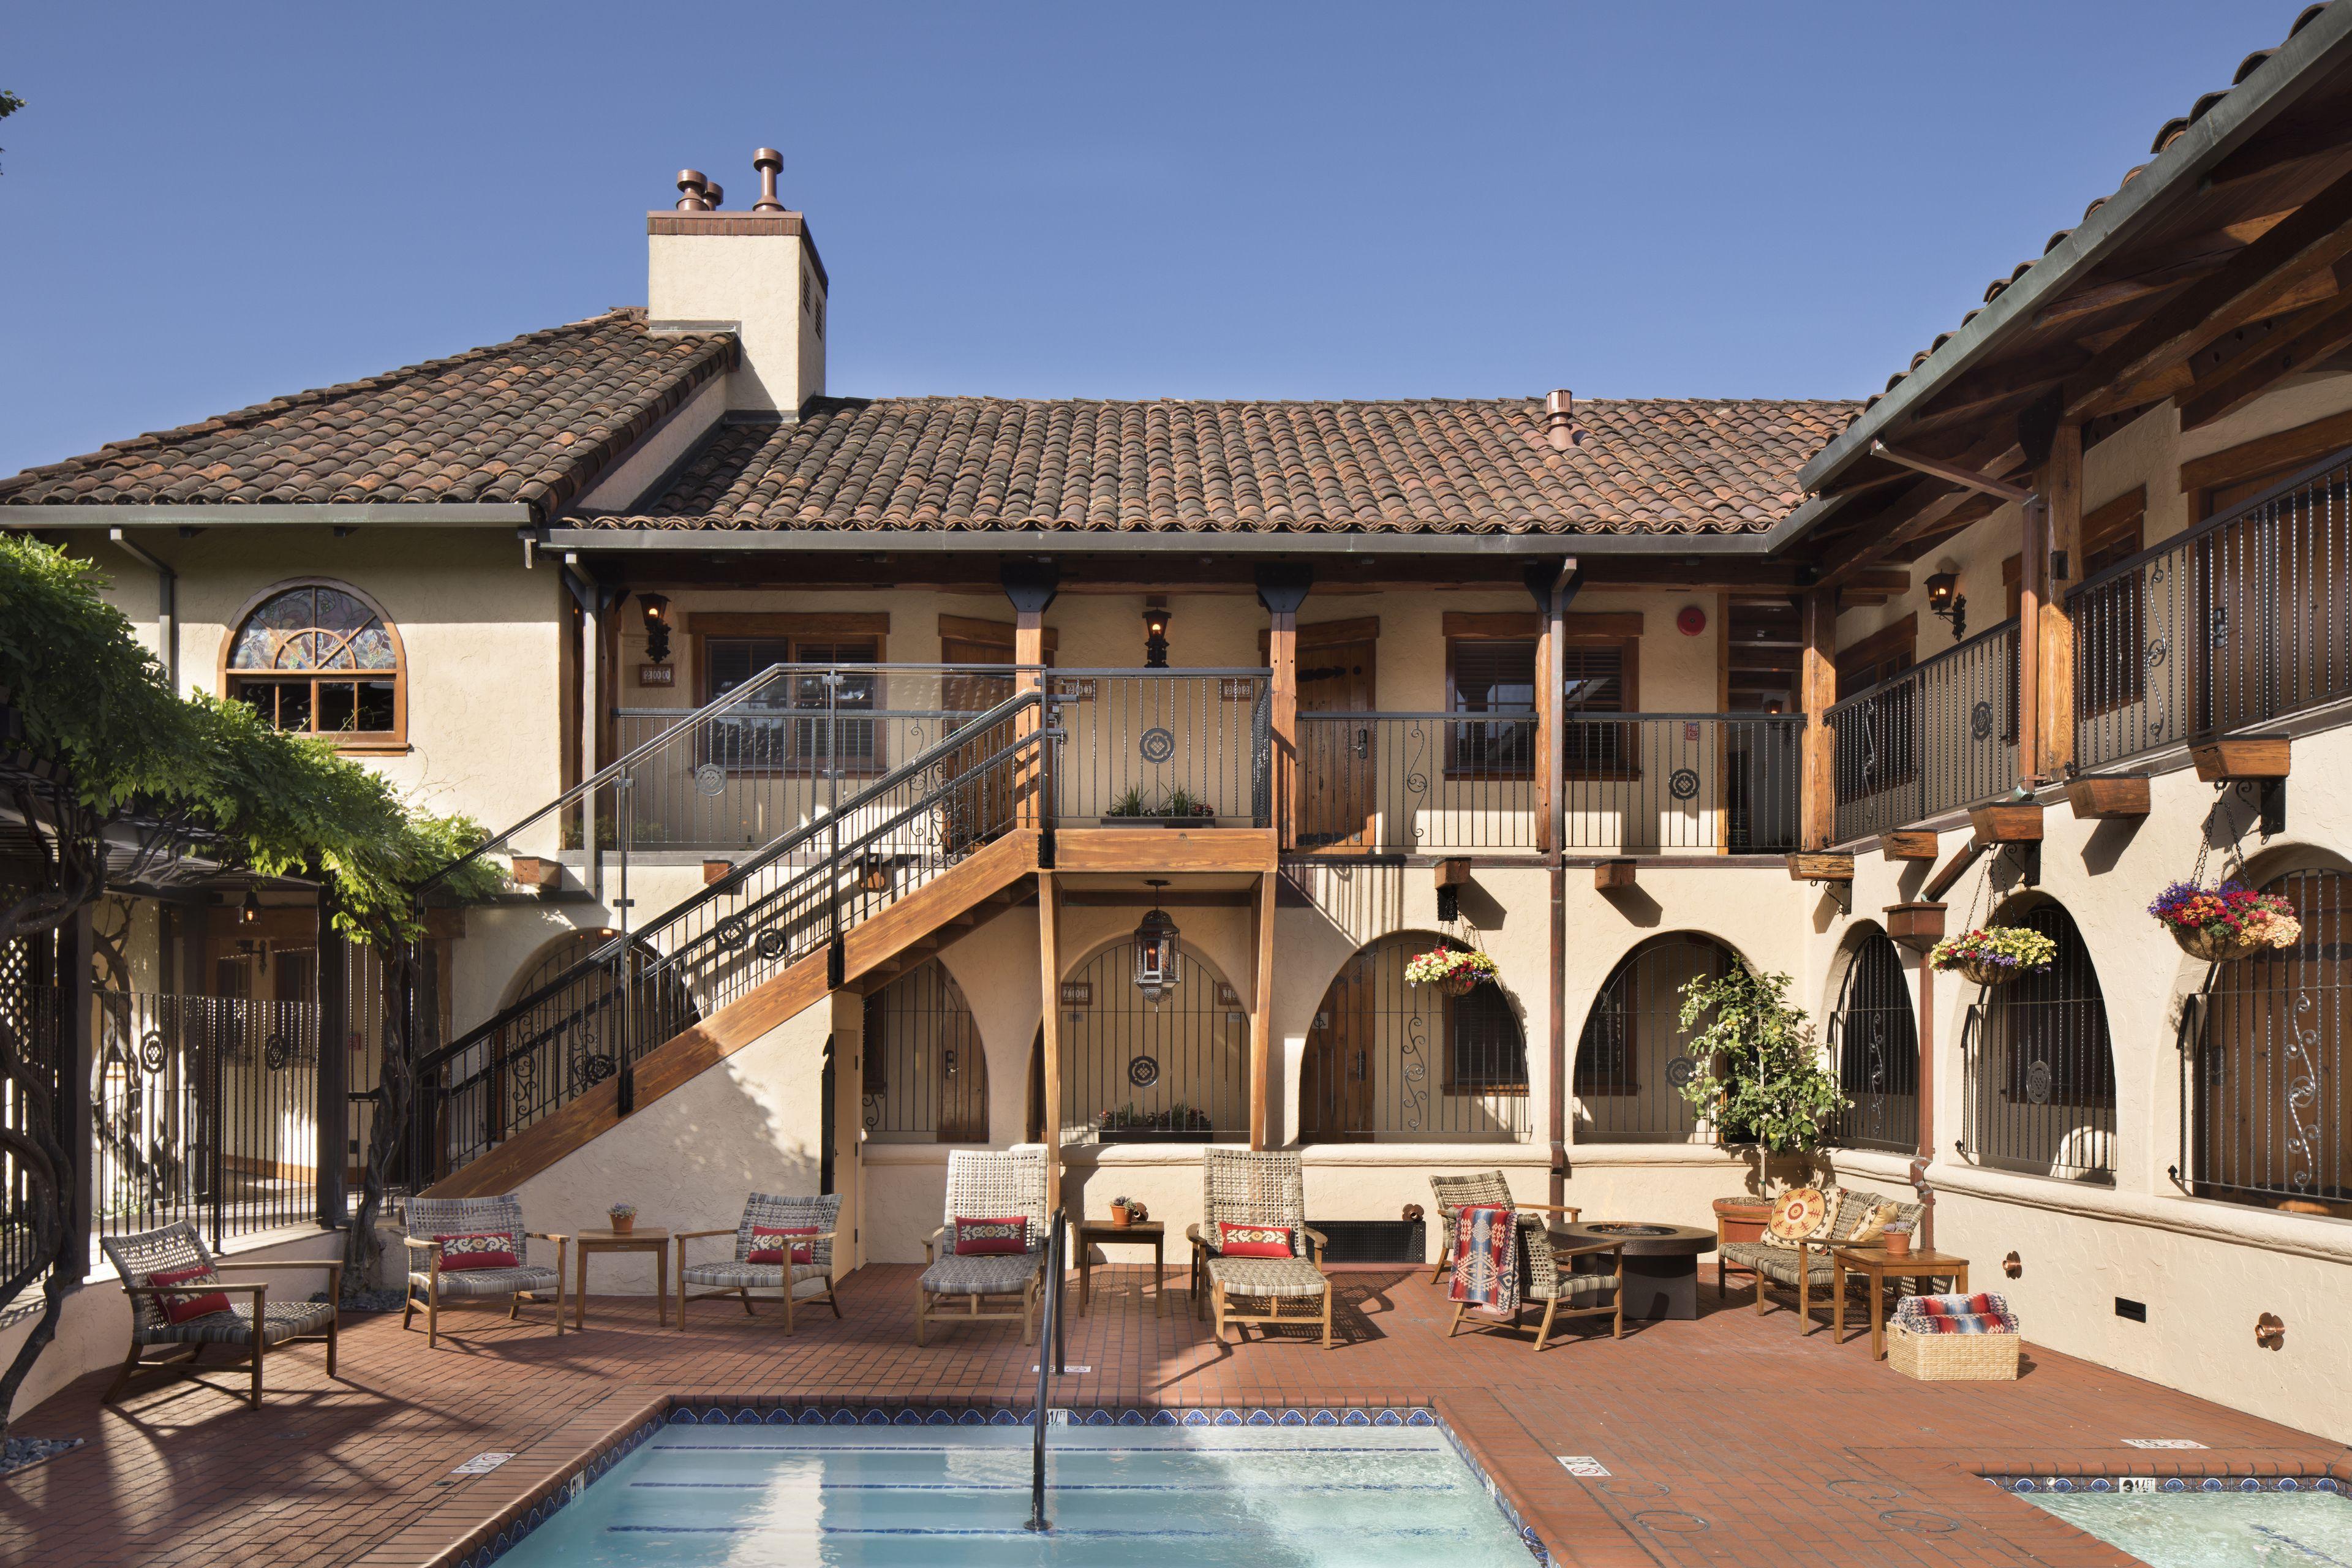 Courtesy of Rancho Caymus Inn / Expedia